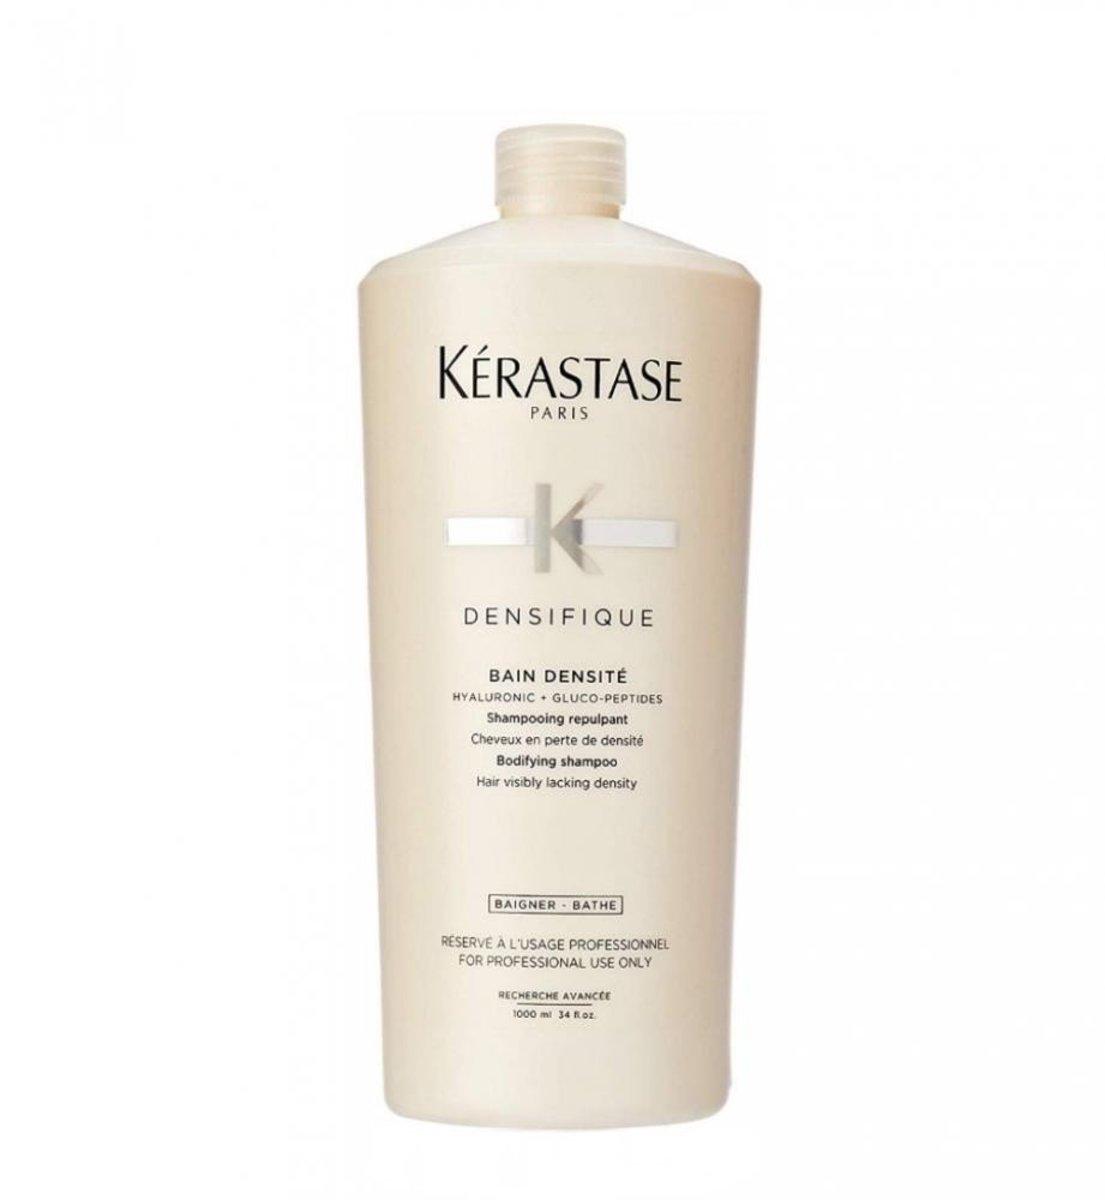 Kerastase Densifique Bain Densite Bodifying Shampoo 1000ml